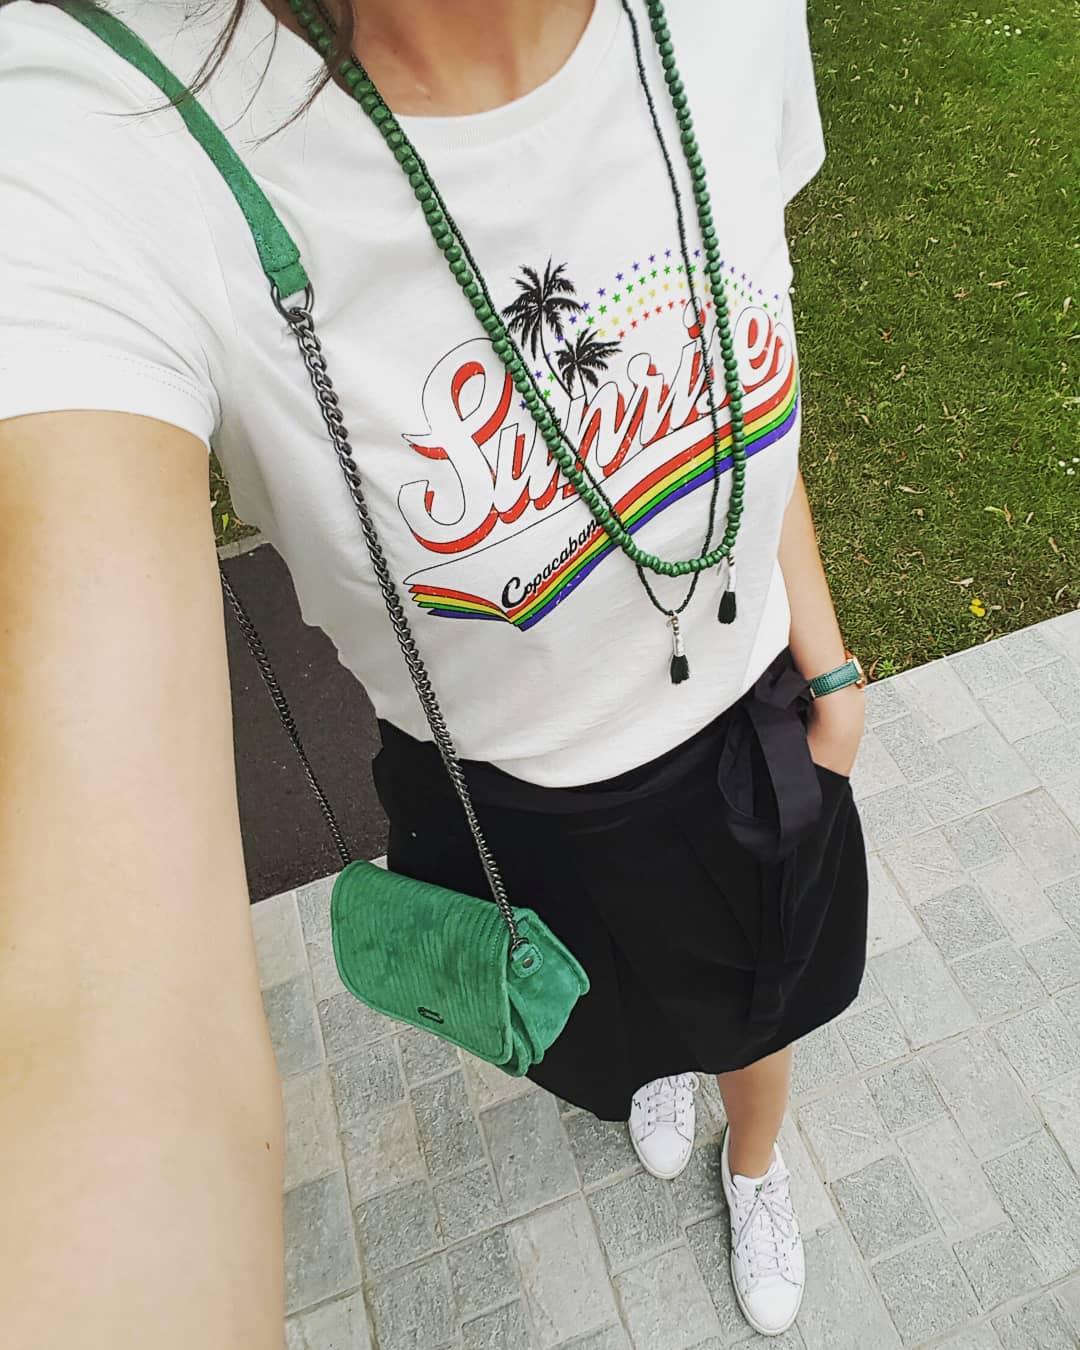 women's sunrise t-shirt de IKKS sur leanestelclem